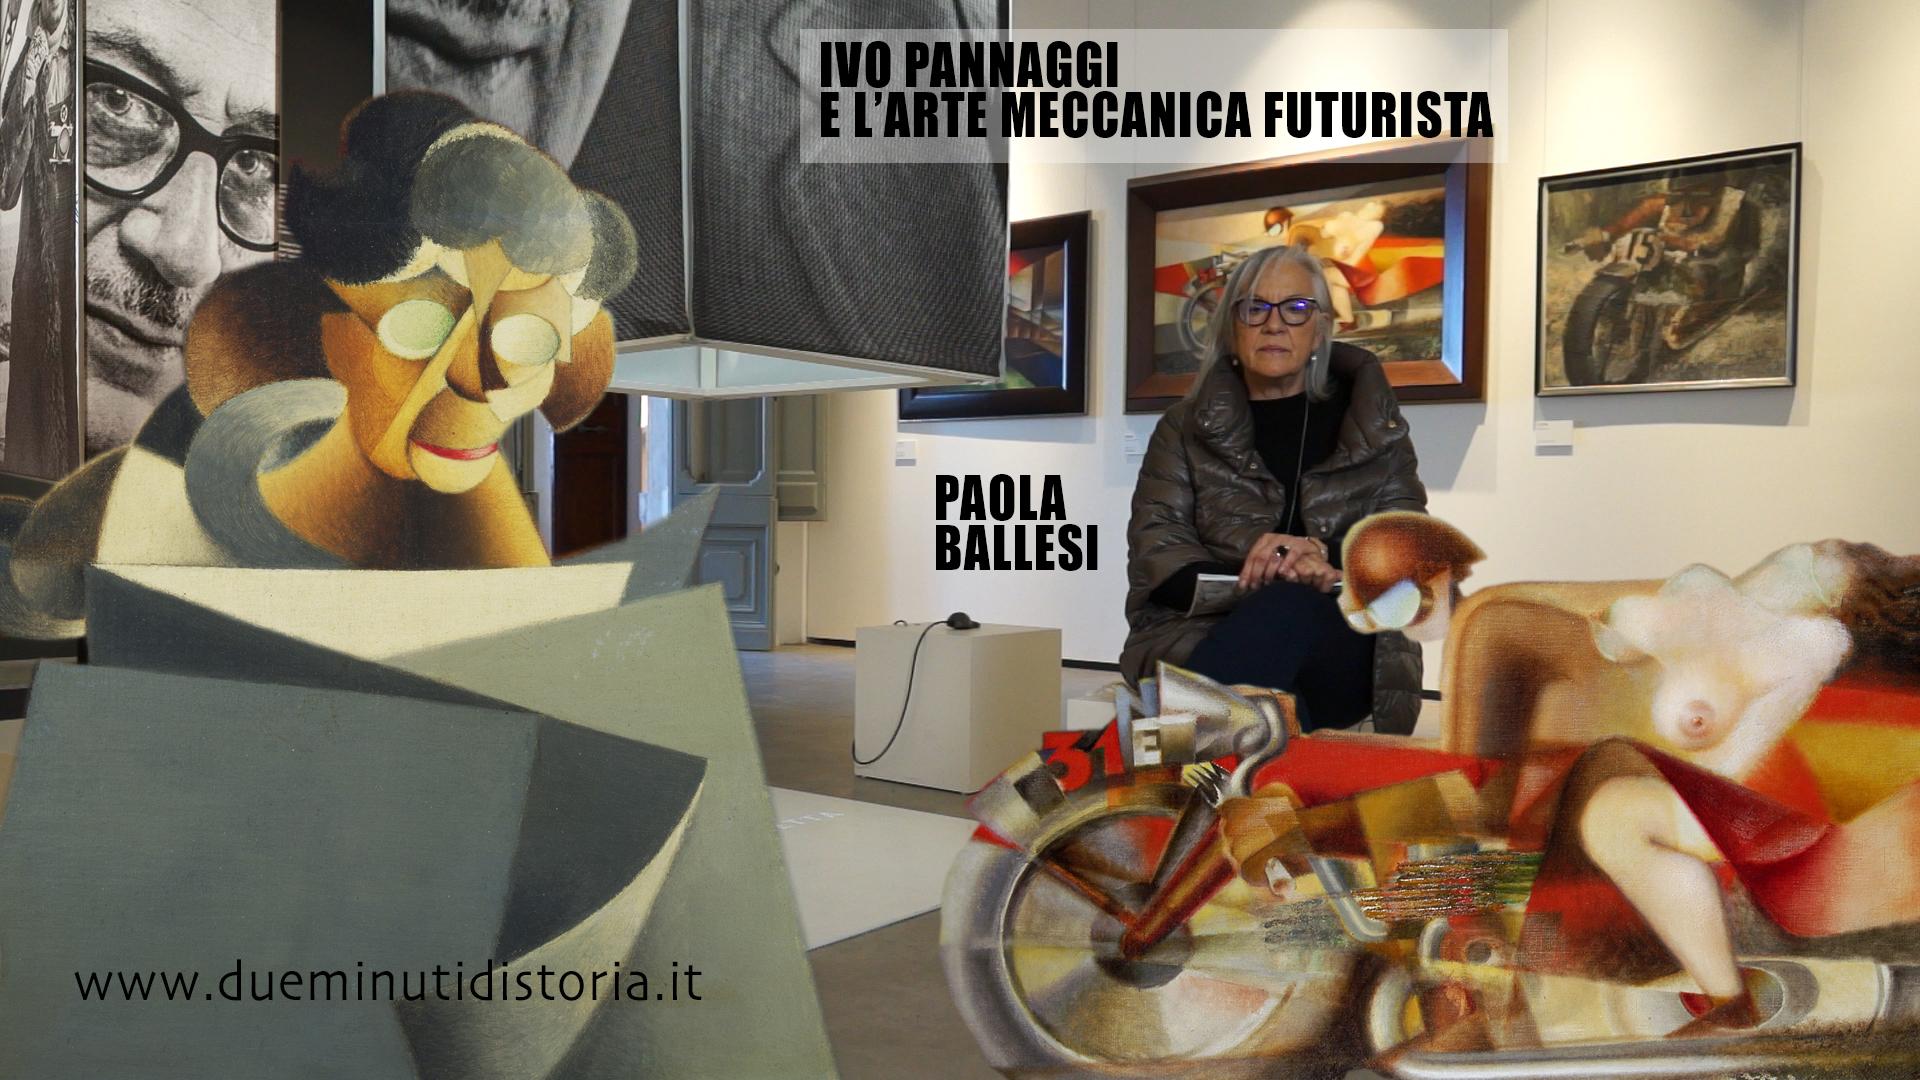 Ivo Pannaggi, l'arte meccanica futurista